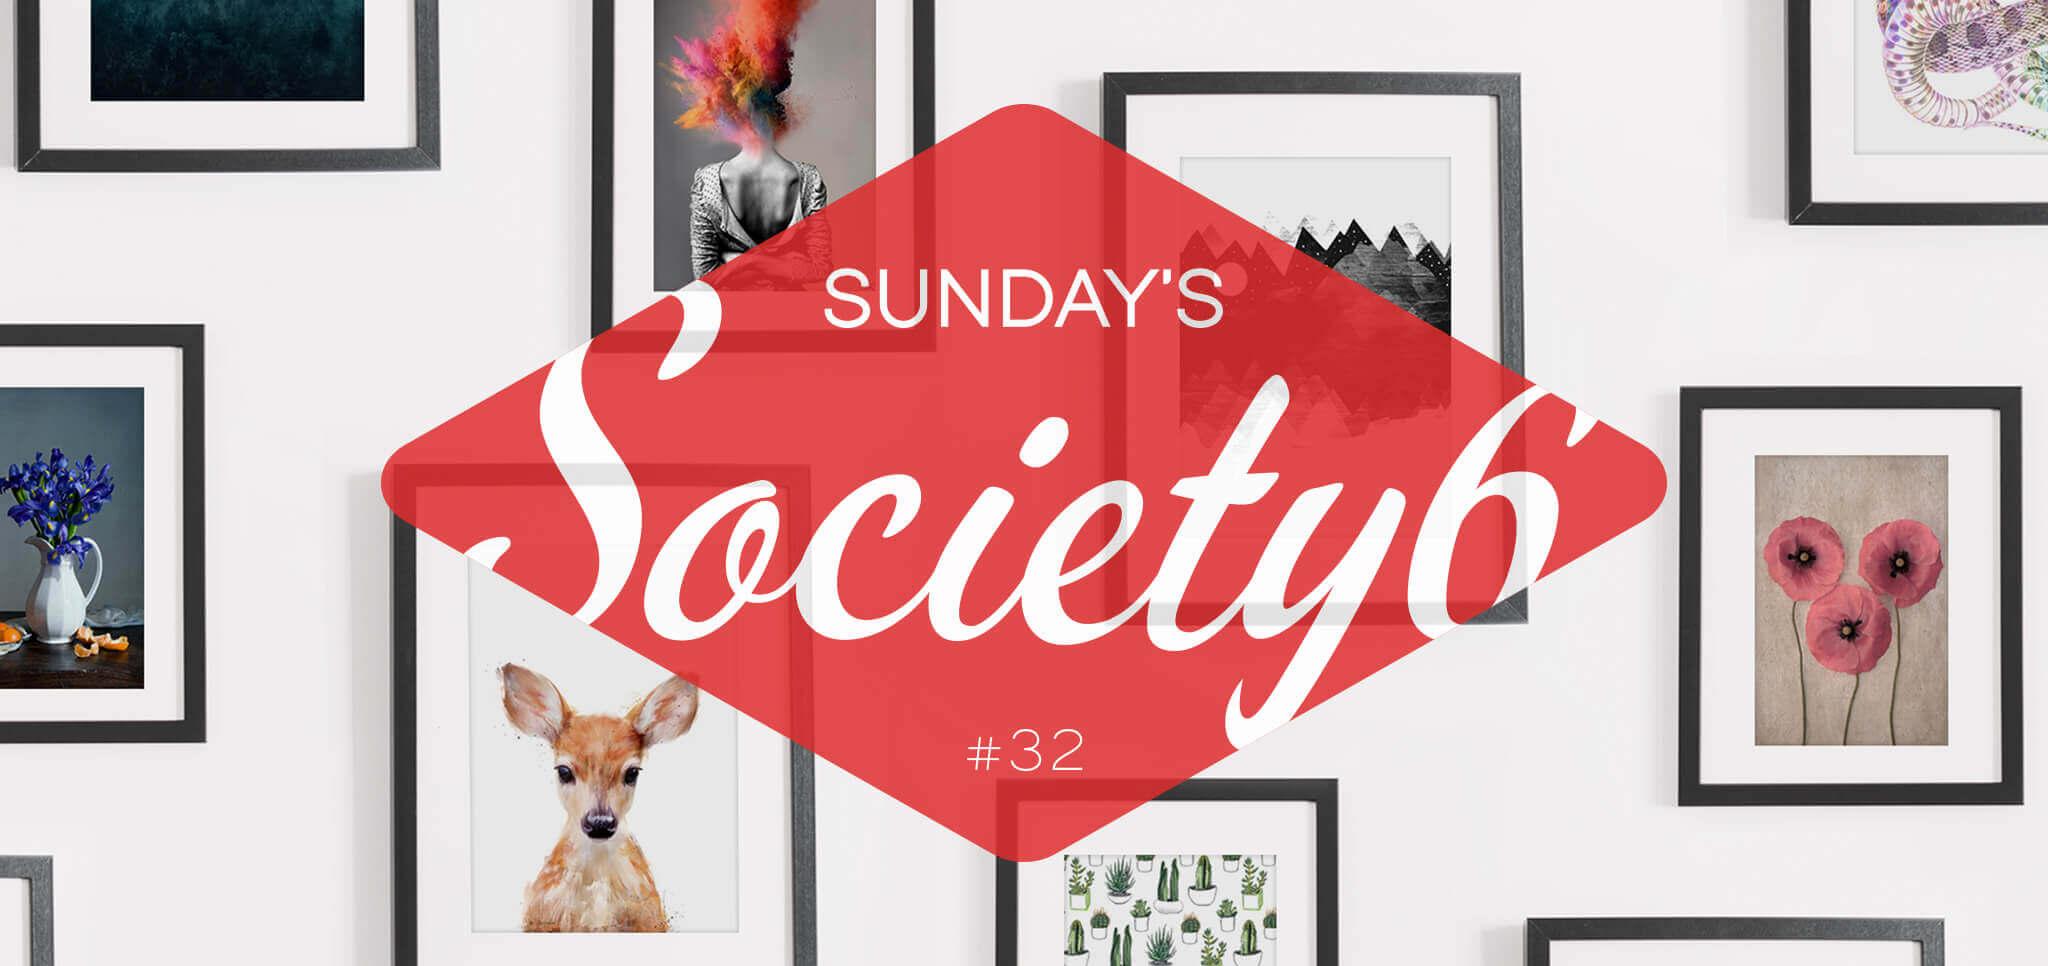 Sunday's Society6 #32 | Color block